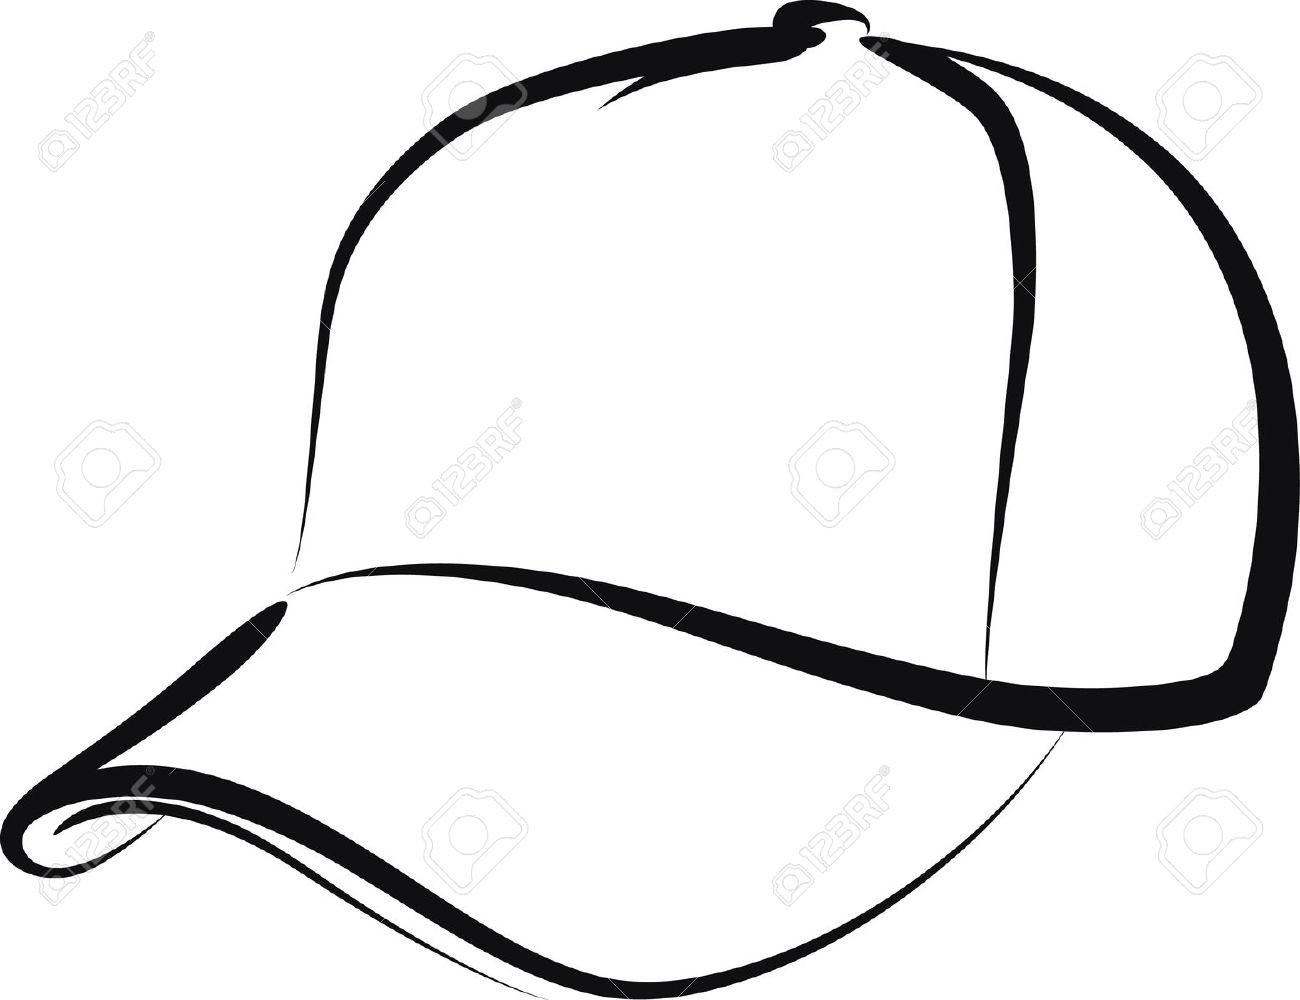 Baseball Cap Clipart - .-Baseball Cap Clipart - .-4